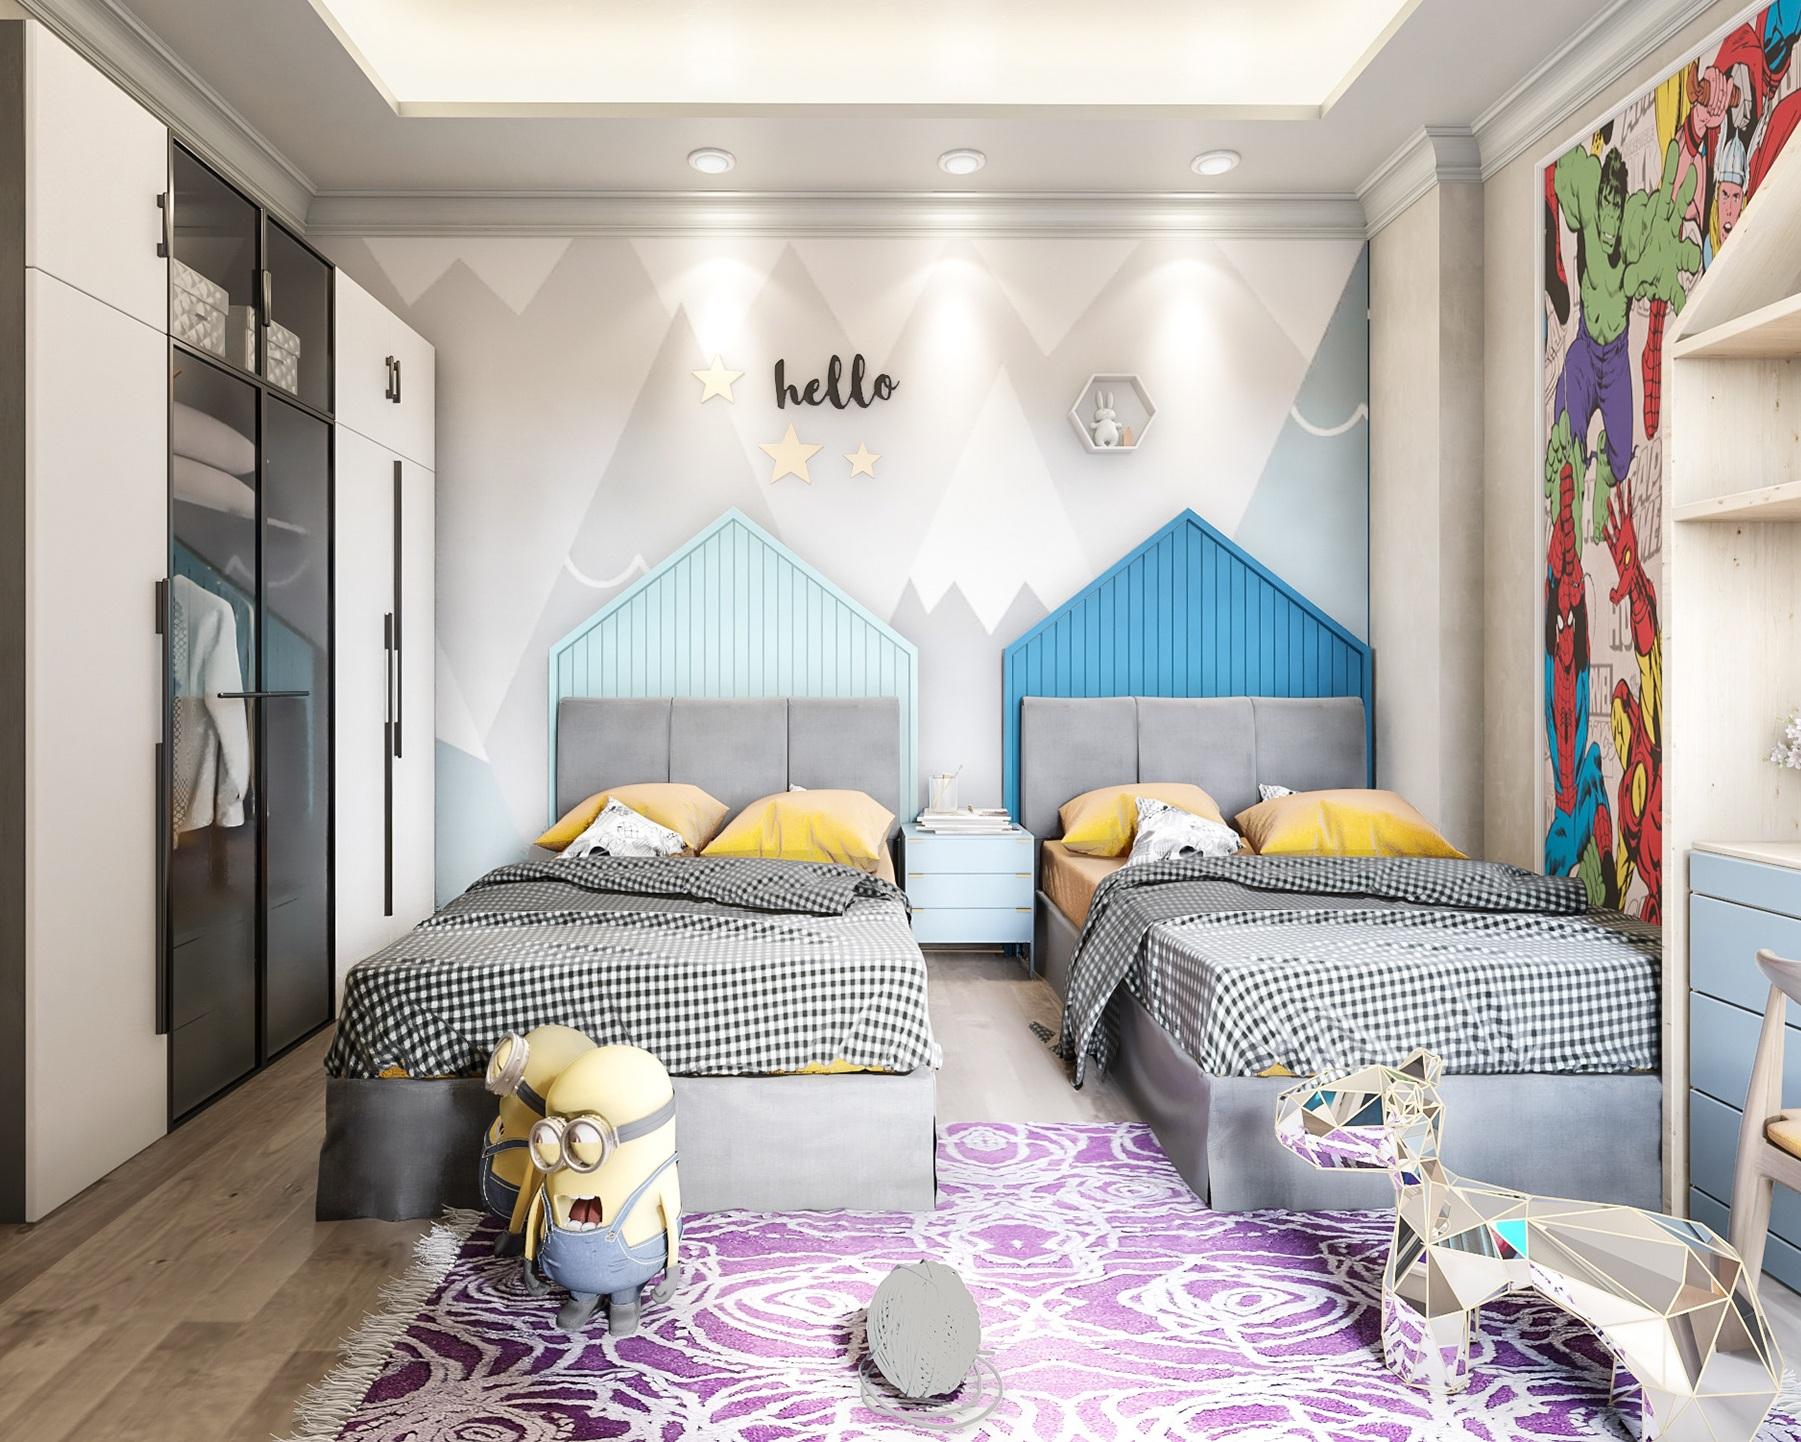 Elegant Superhero Theme Kids Bedroom Ideas With Shared Bed